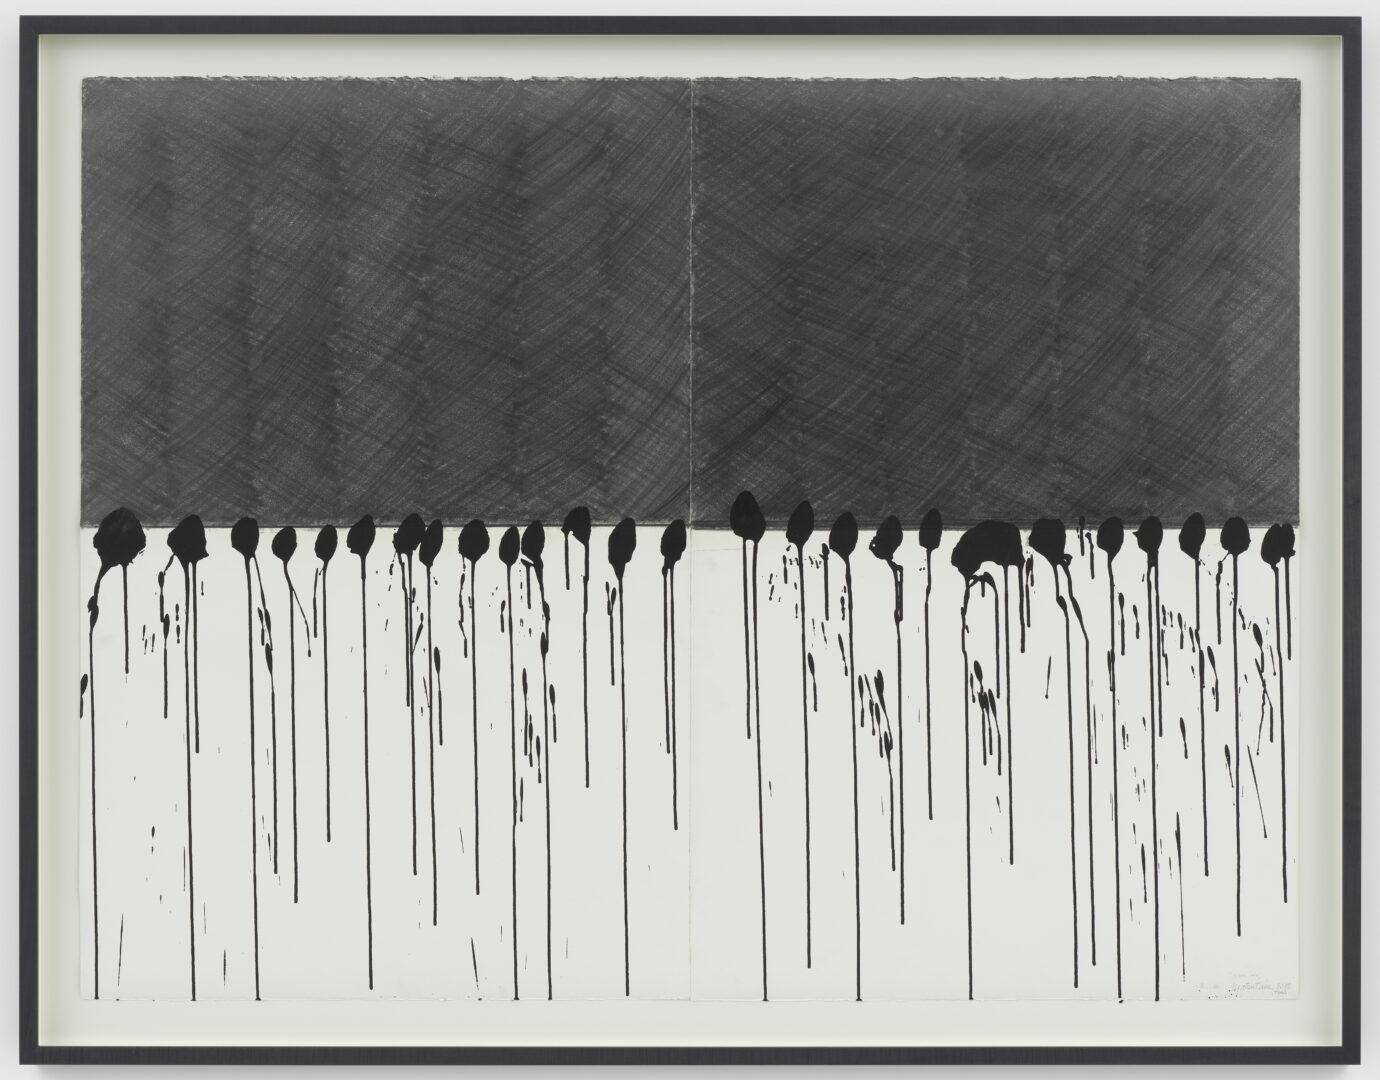 Exhibition View Takesada Matsutani Soloshow «Yohaku; view on Black Rain, 2015» at Hauser & Wirth, Zurich, 2019 / © Takesada Matsutani / Courtesy: the artist and Hauser & Wirth